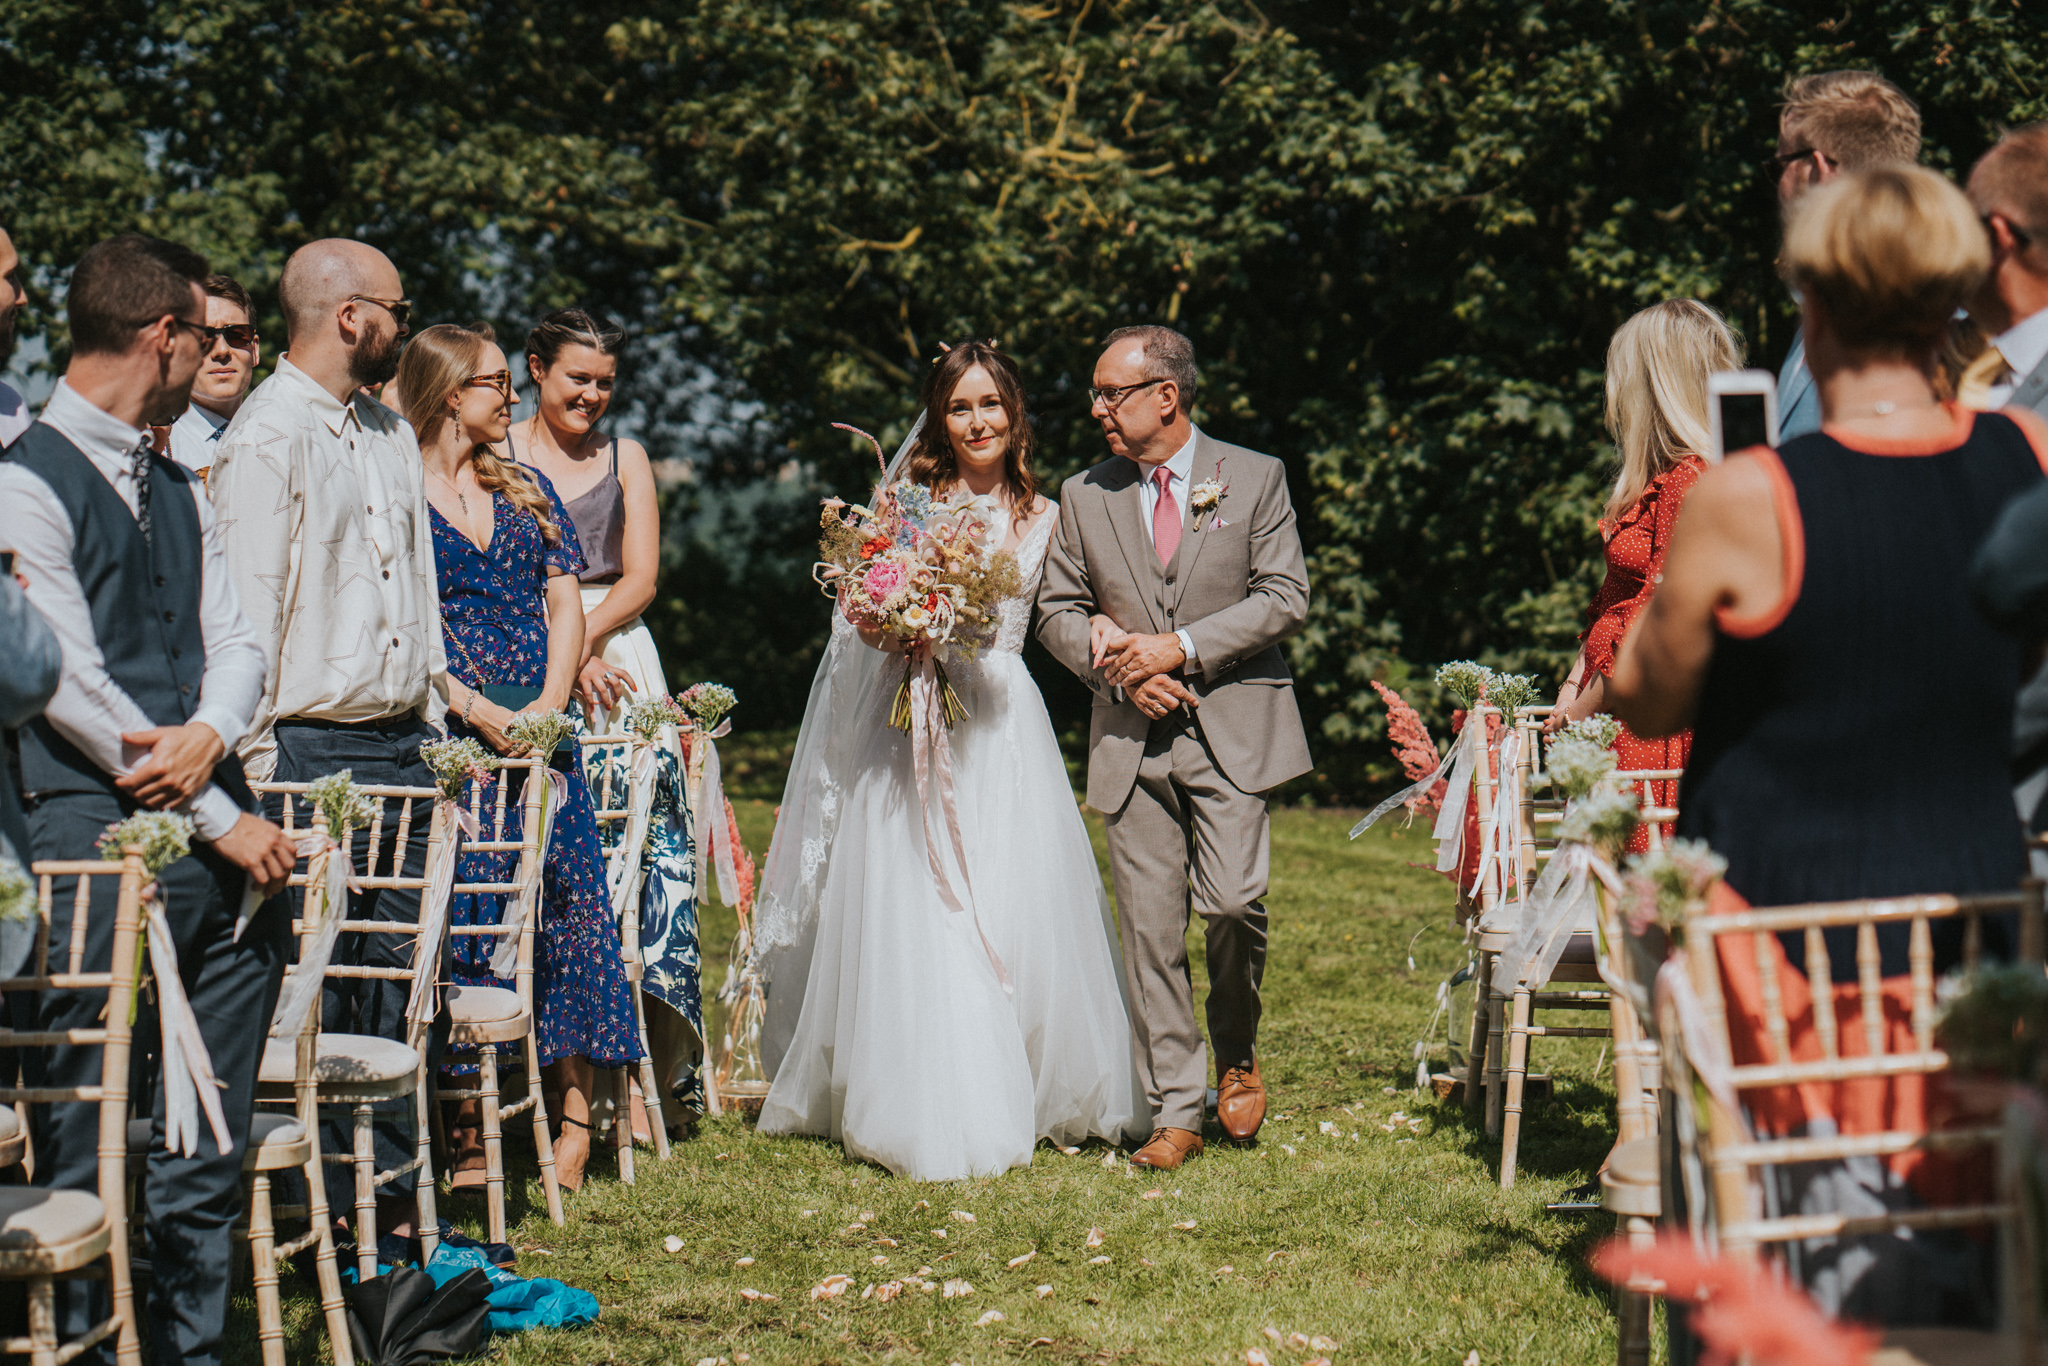 emi-Jack-boho-diy-wedding-eggington-house-grace-elizabeth-colchester-essex-alternative-wedding-photographer-suffolk-norfolk-devon (12 of 56).jpg